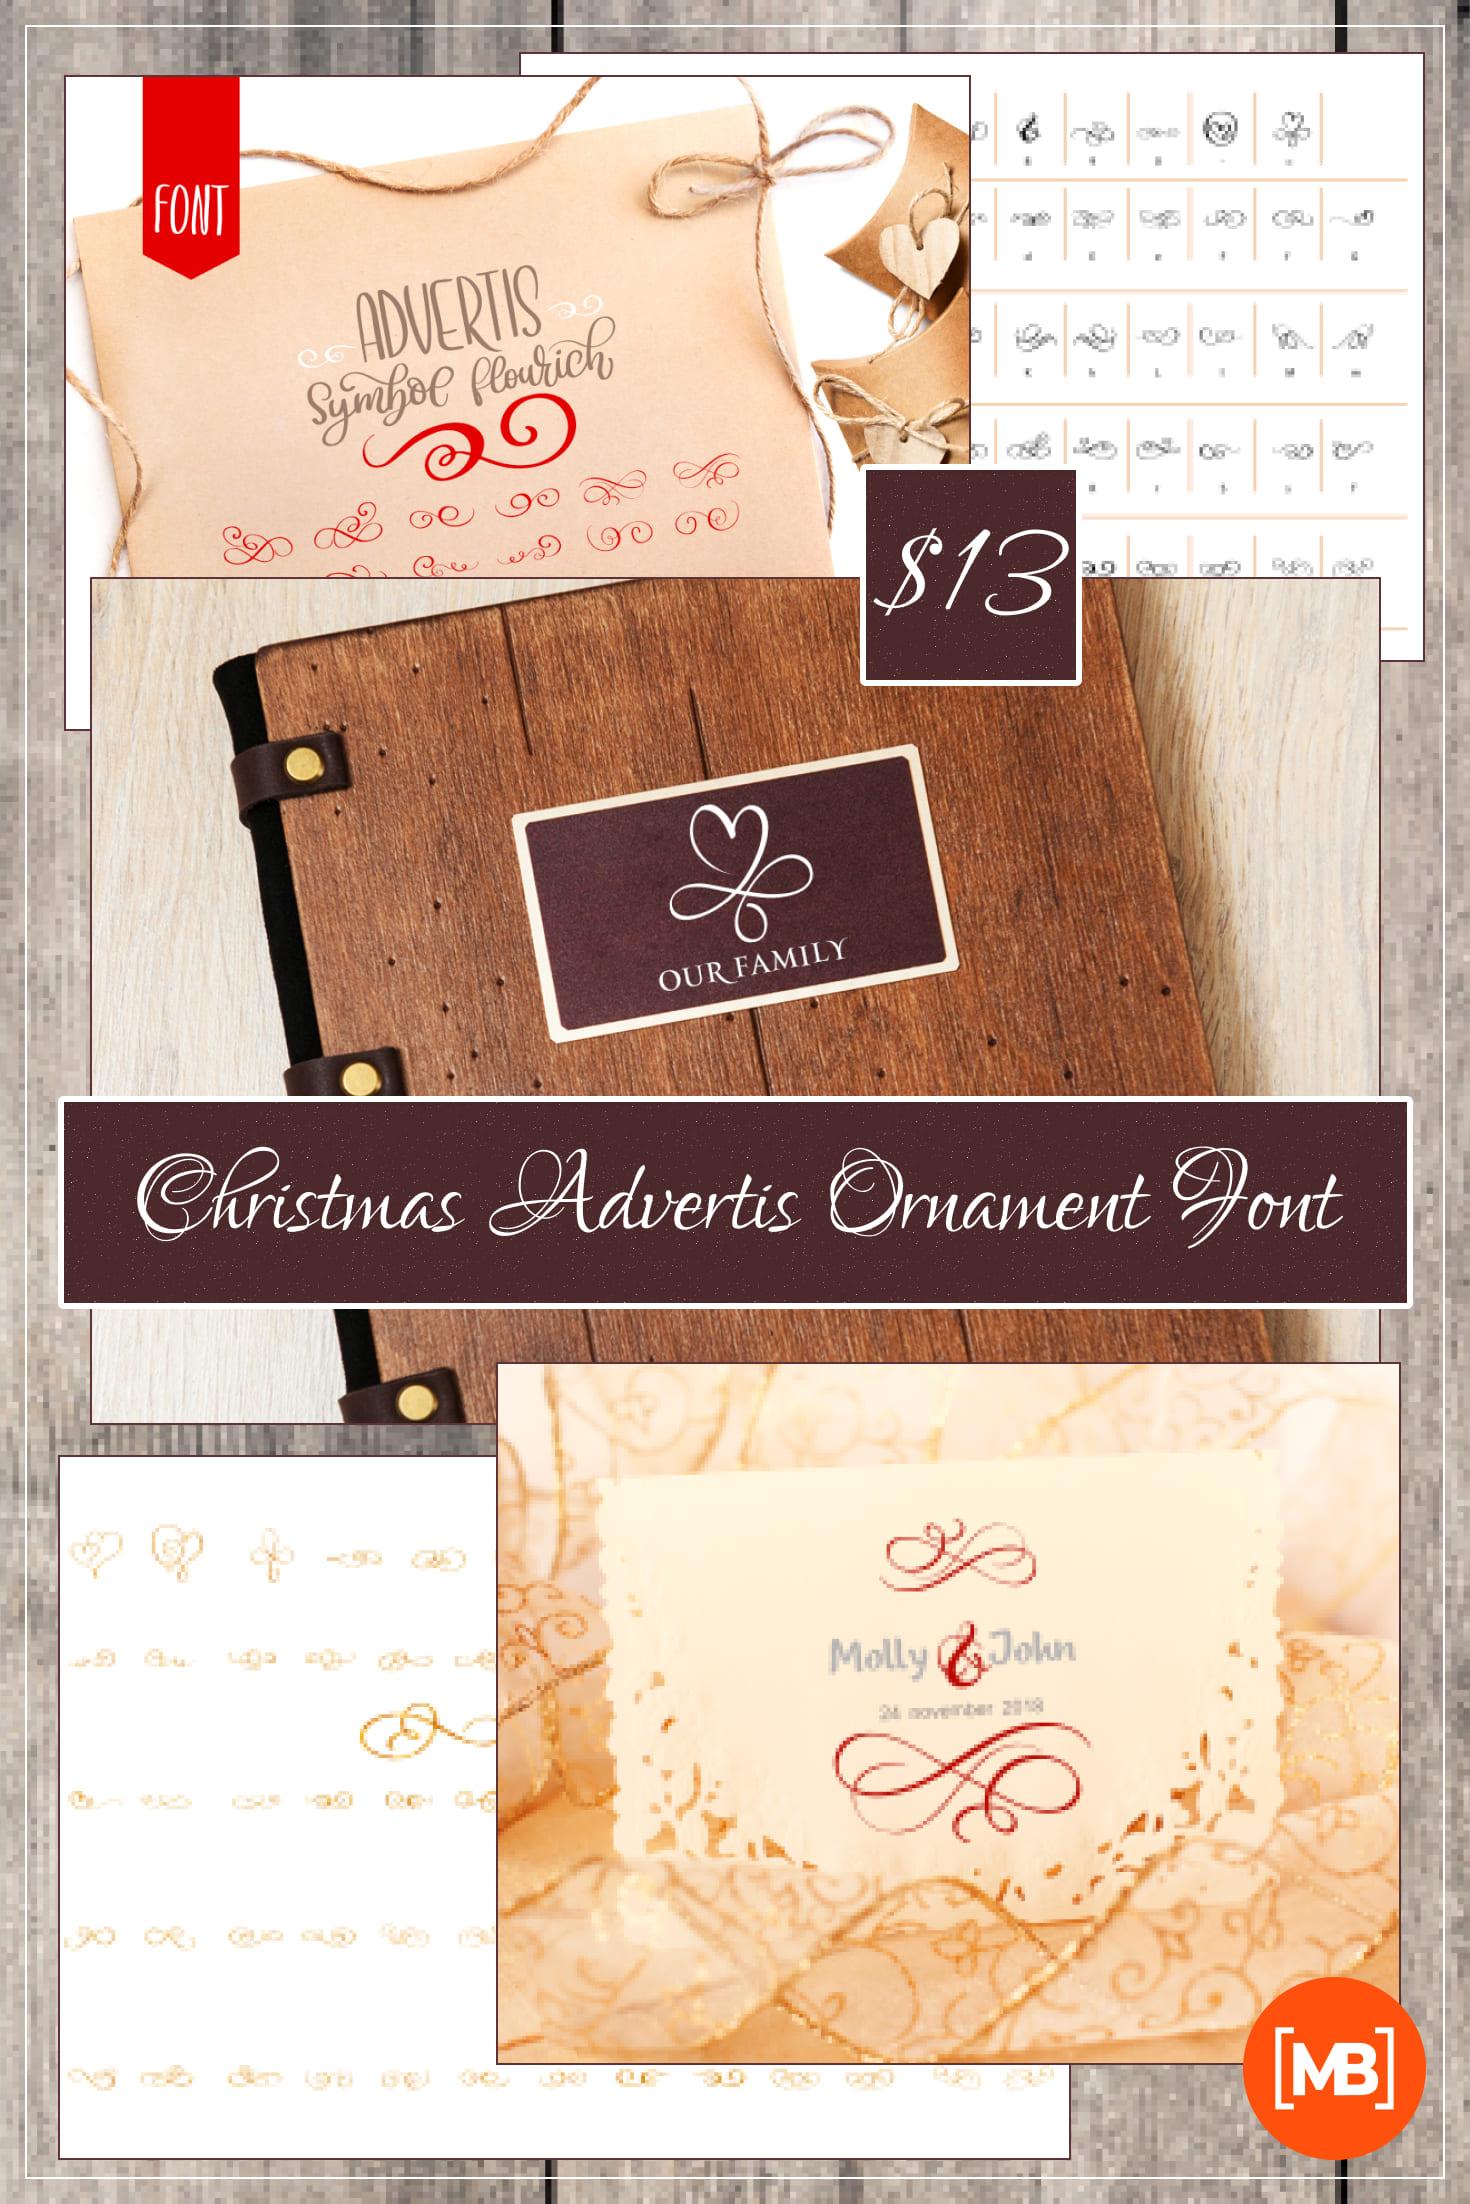 Pinterest Image: Christmas Advertis Ornament Font - $13.